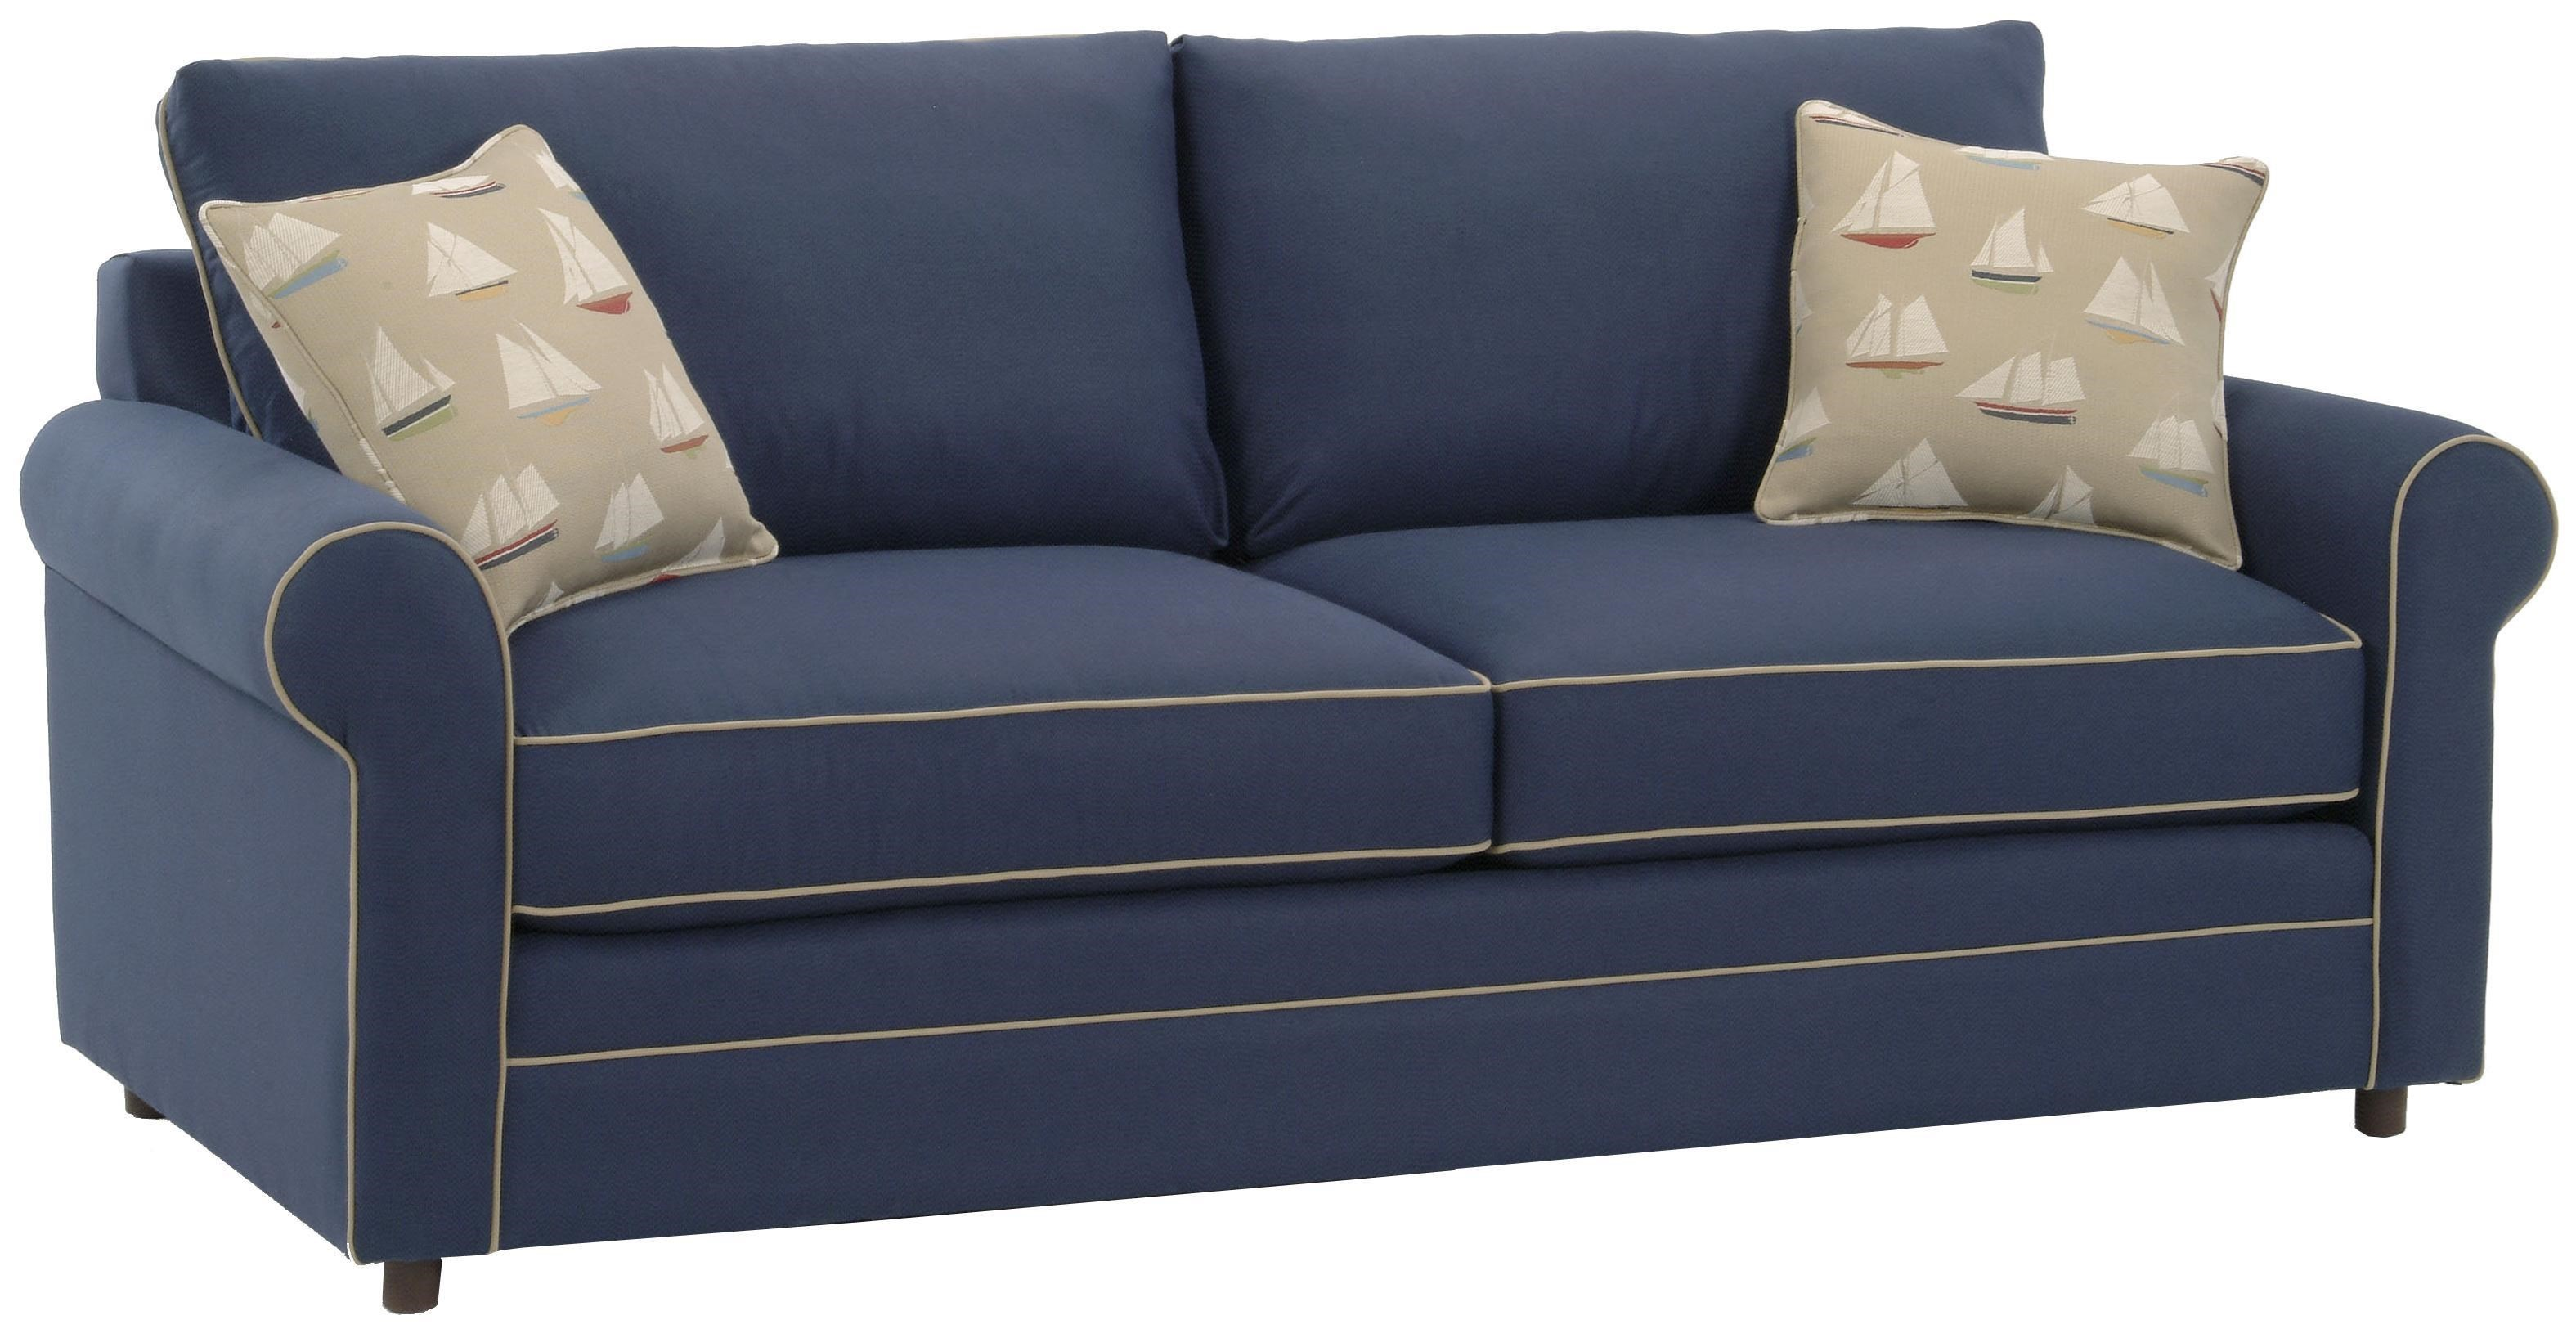 Braxton Culler EdgeworthUpholstered Sleeper Sofa